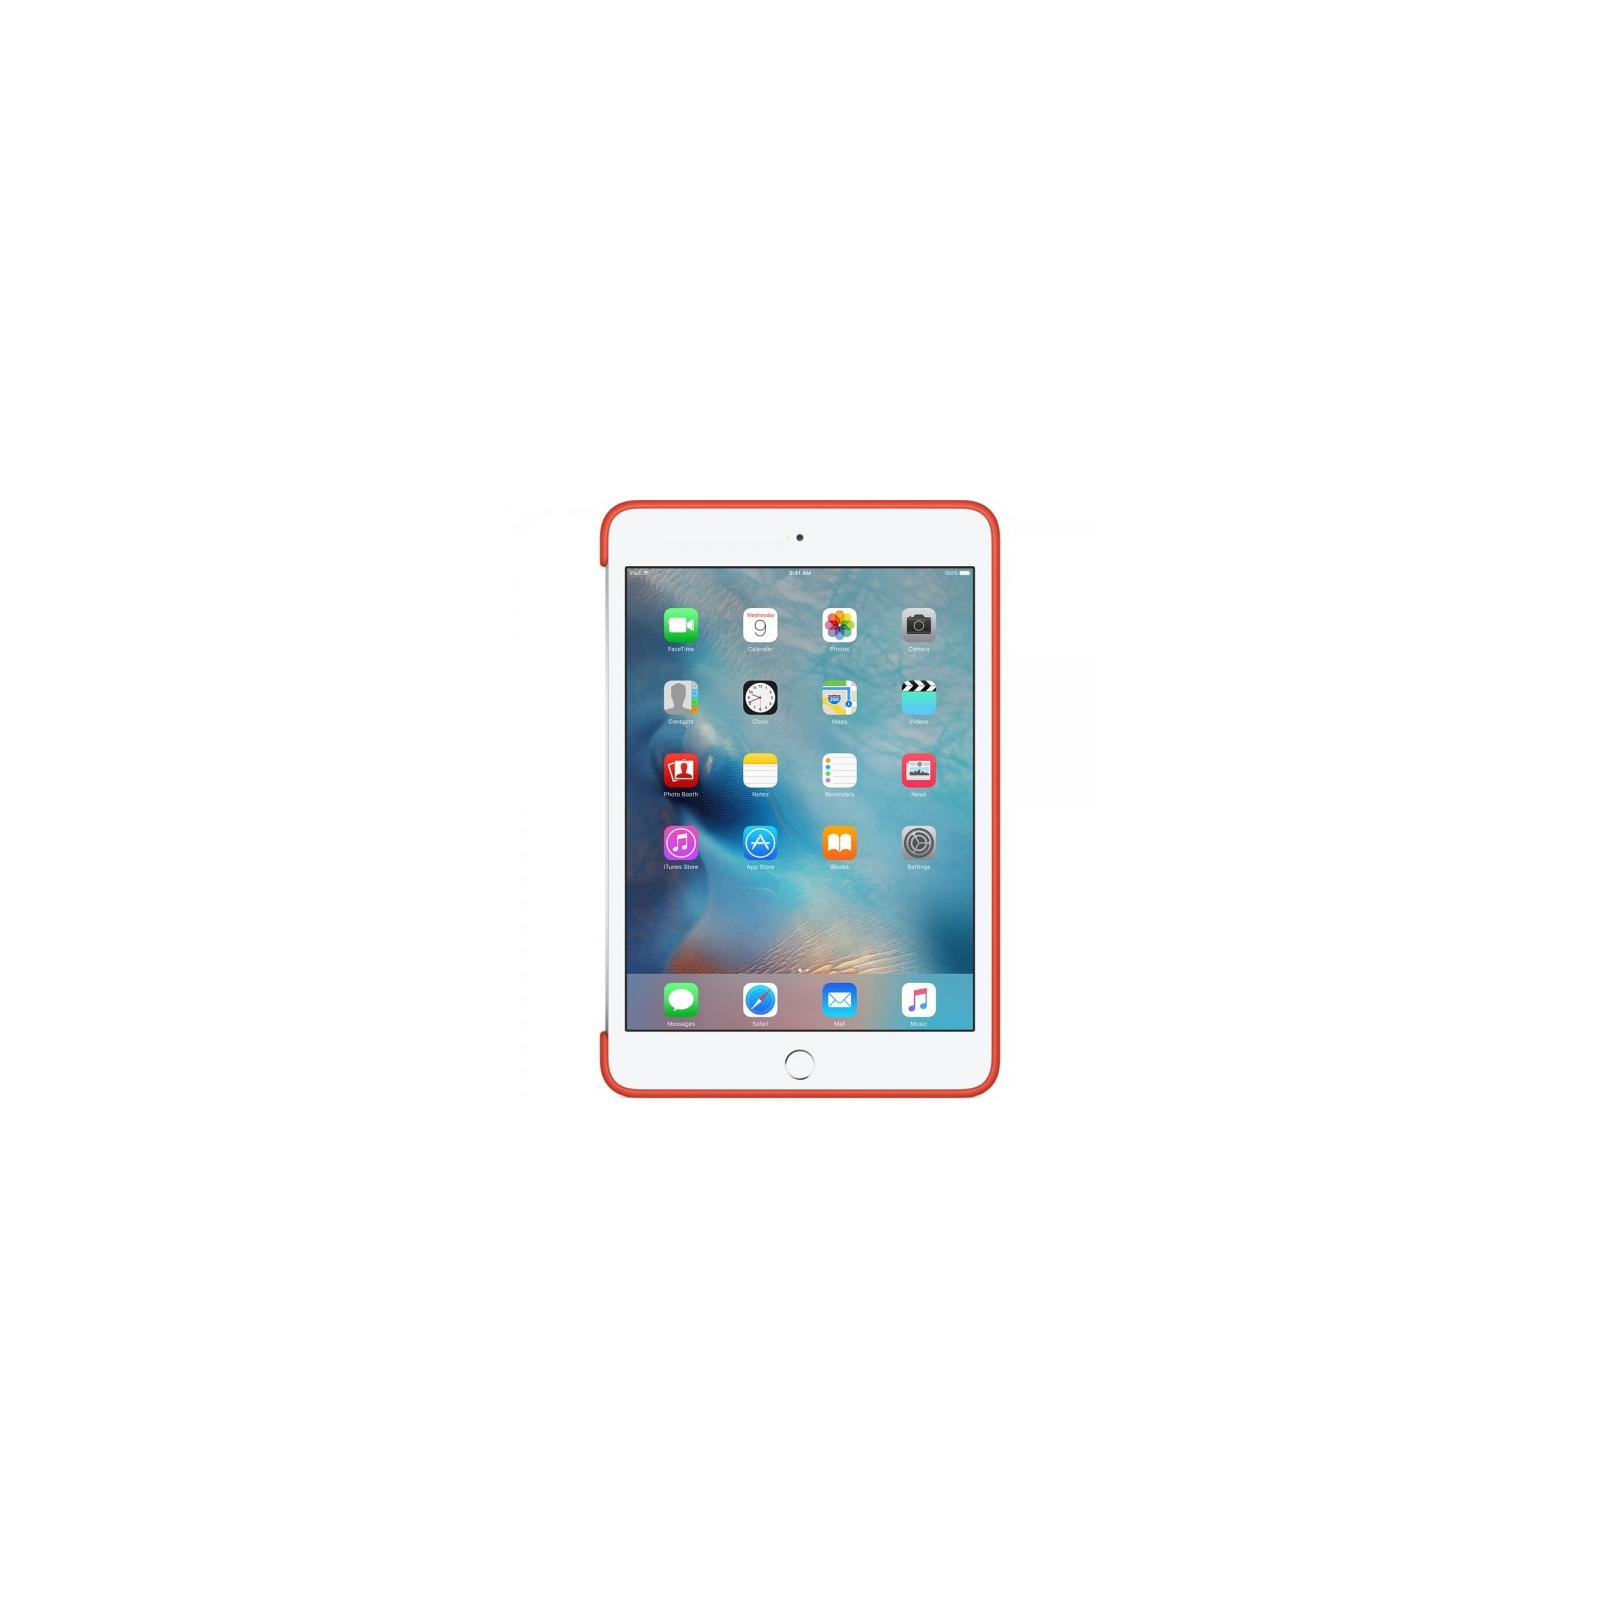 Чехол для планшета Apple iPad mini 4 Orange (MLD42ZM/A) изображение 4